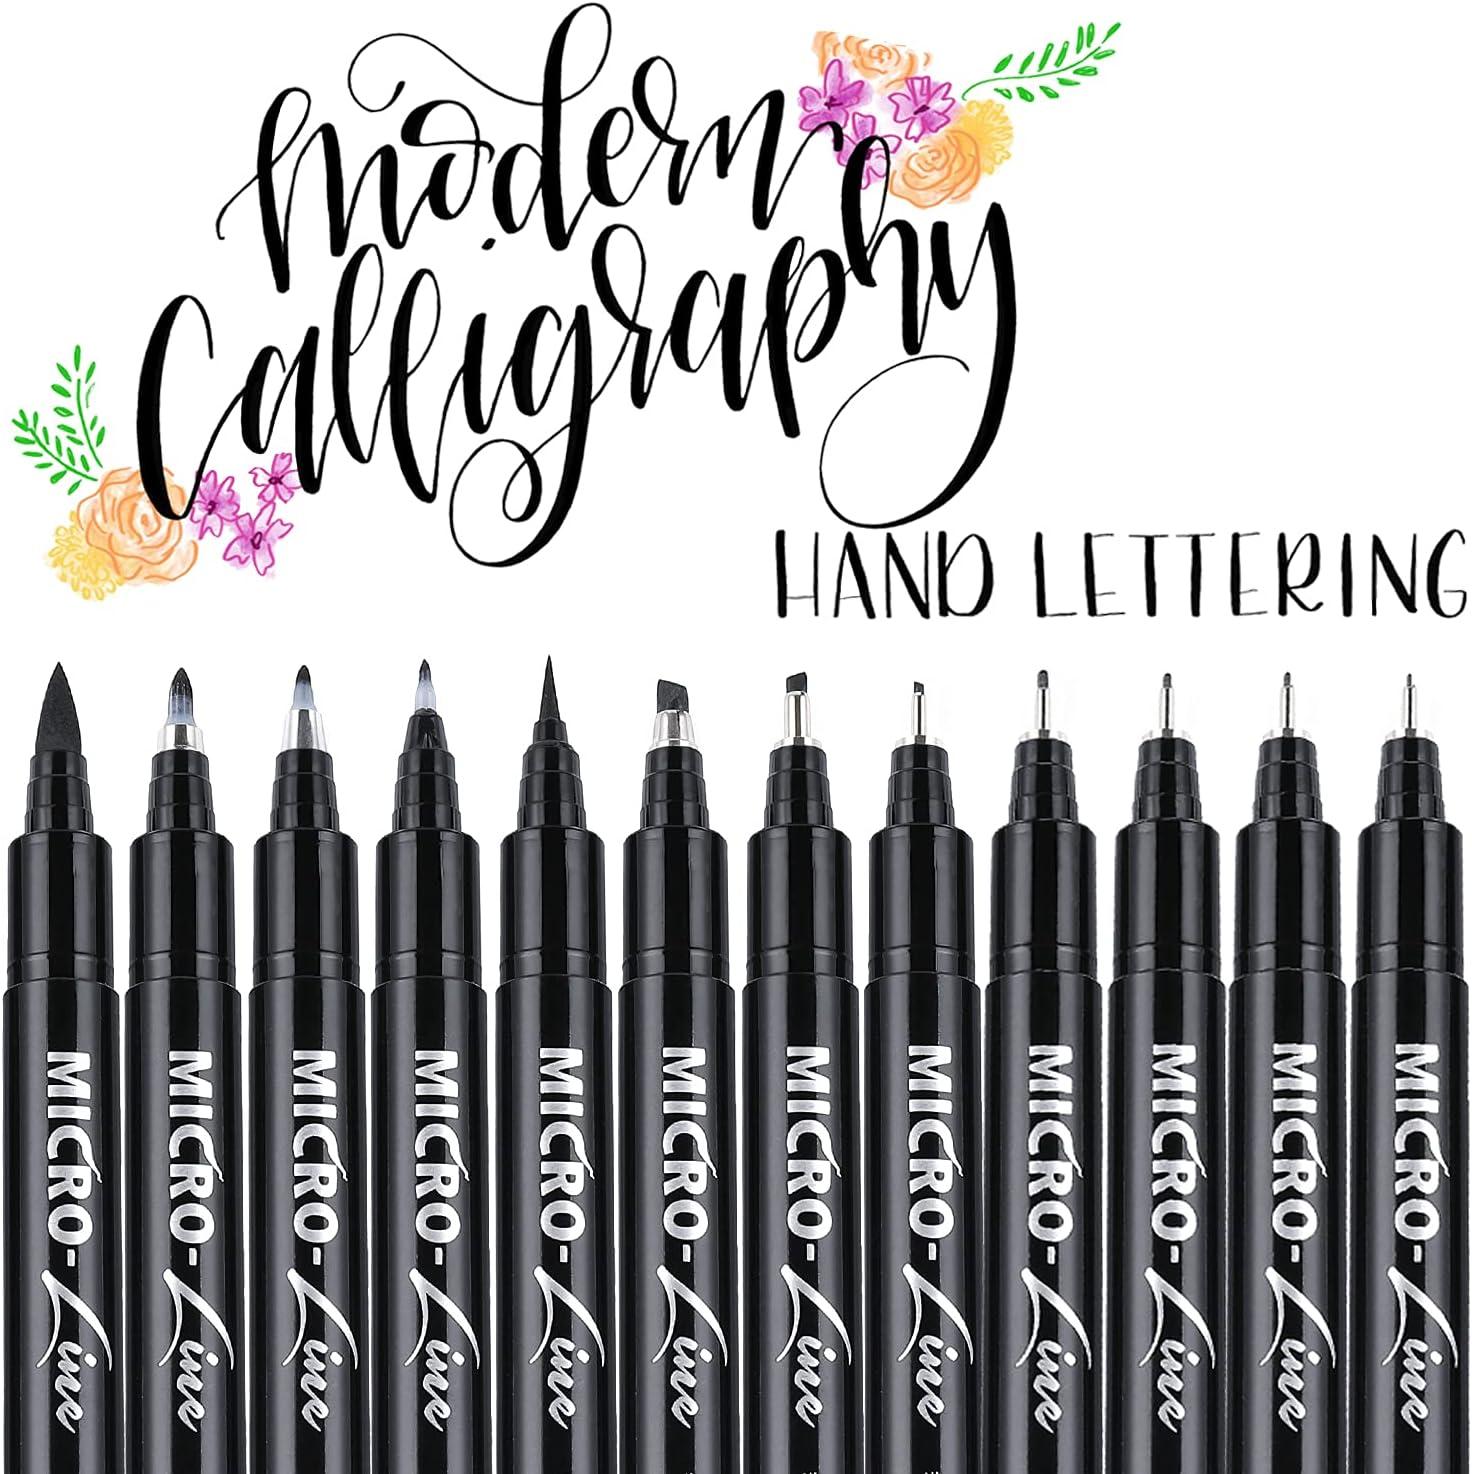 Calligraphy Hand Lettering Brush Pens